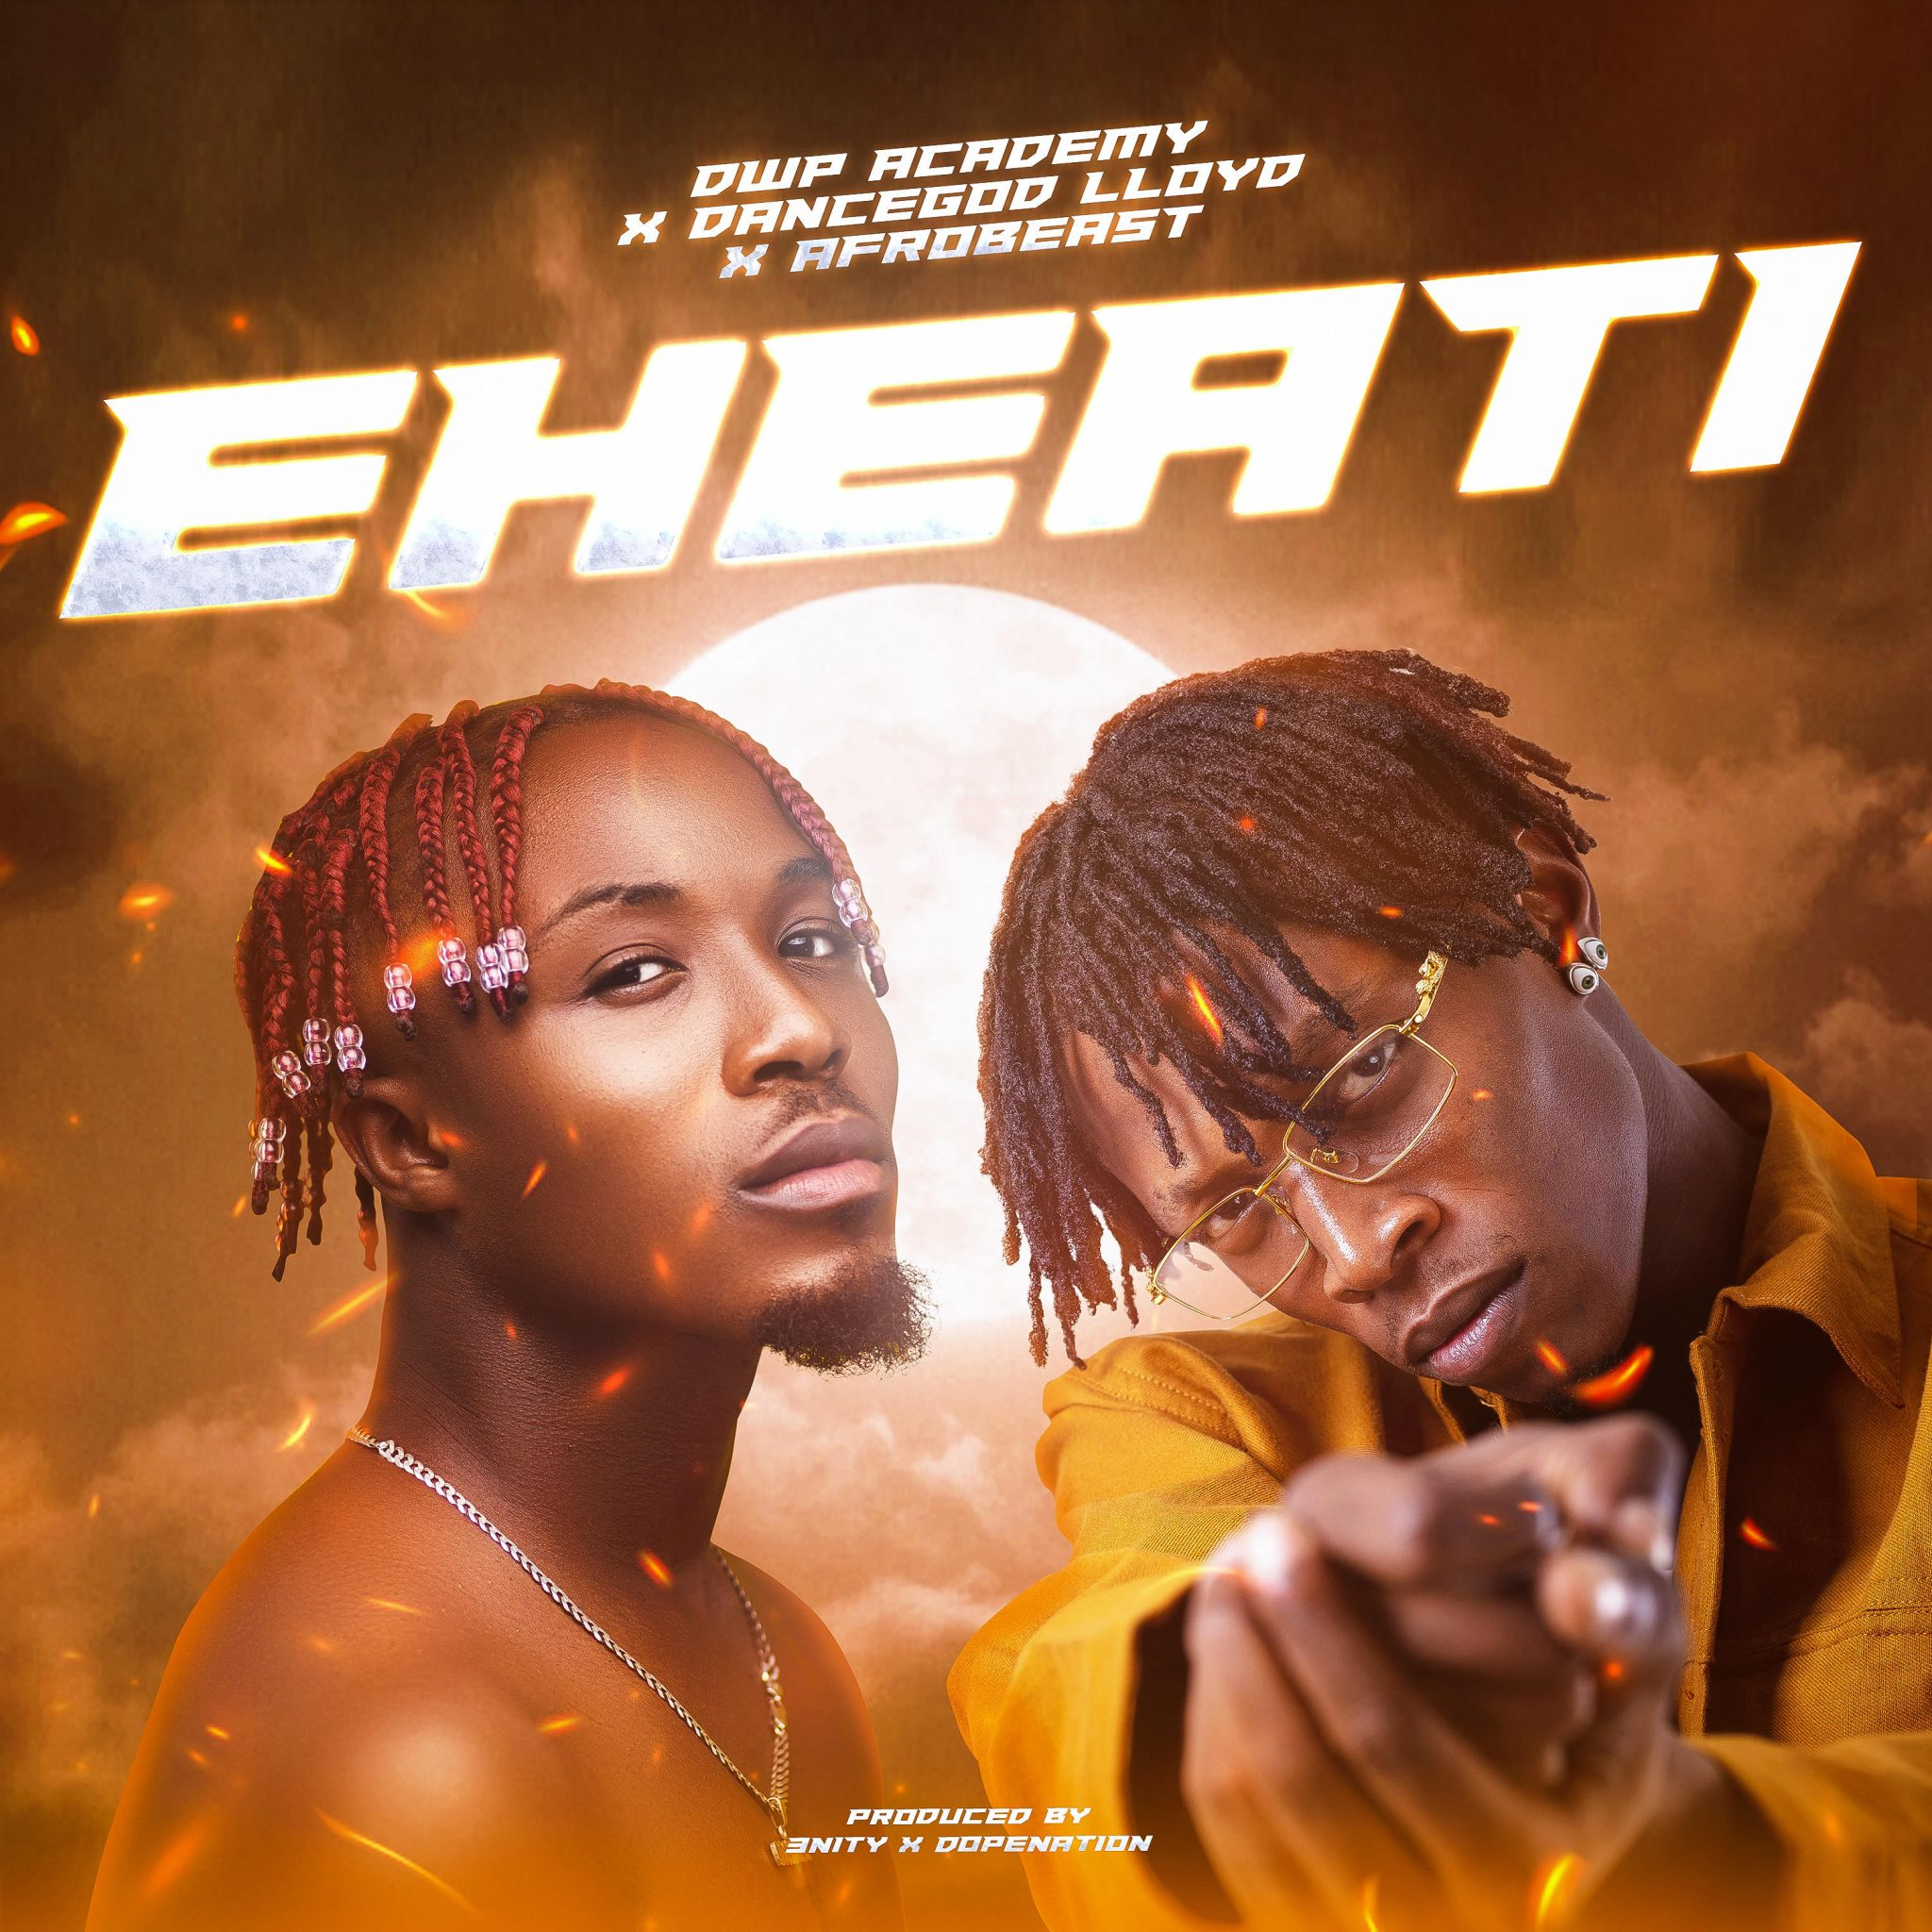 Dancegod Lloyd – Eheati Ft. Afrobeast mp3 download